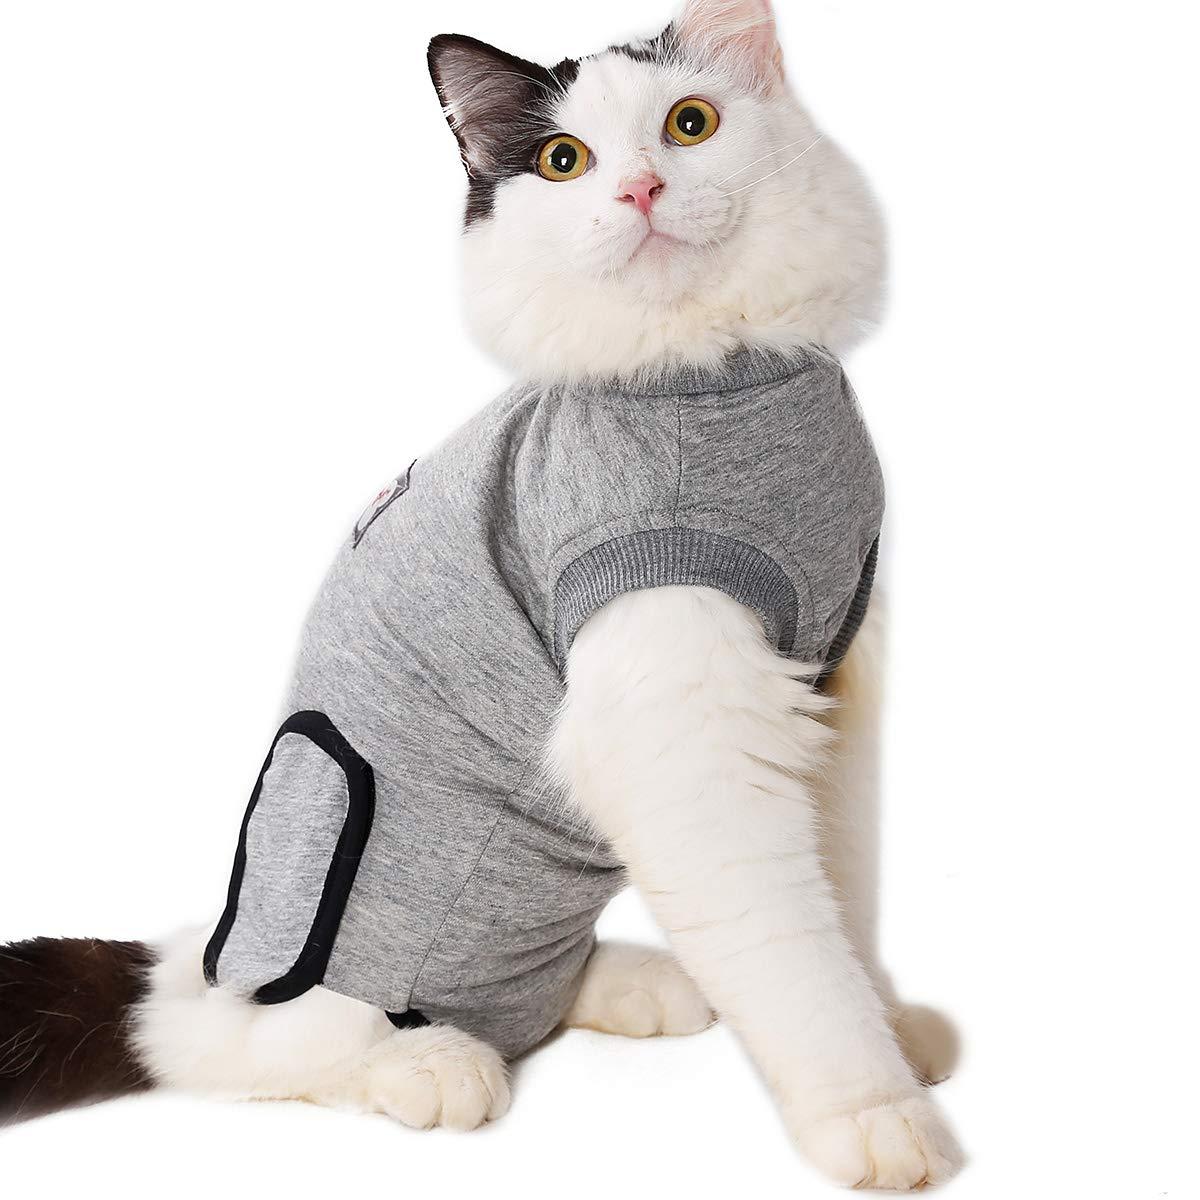 Urijk Cat Thunder Shirt for Cats